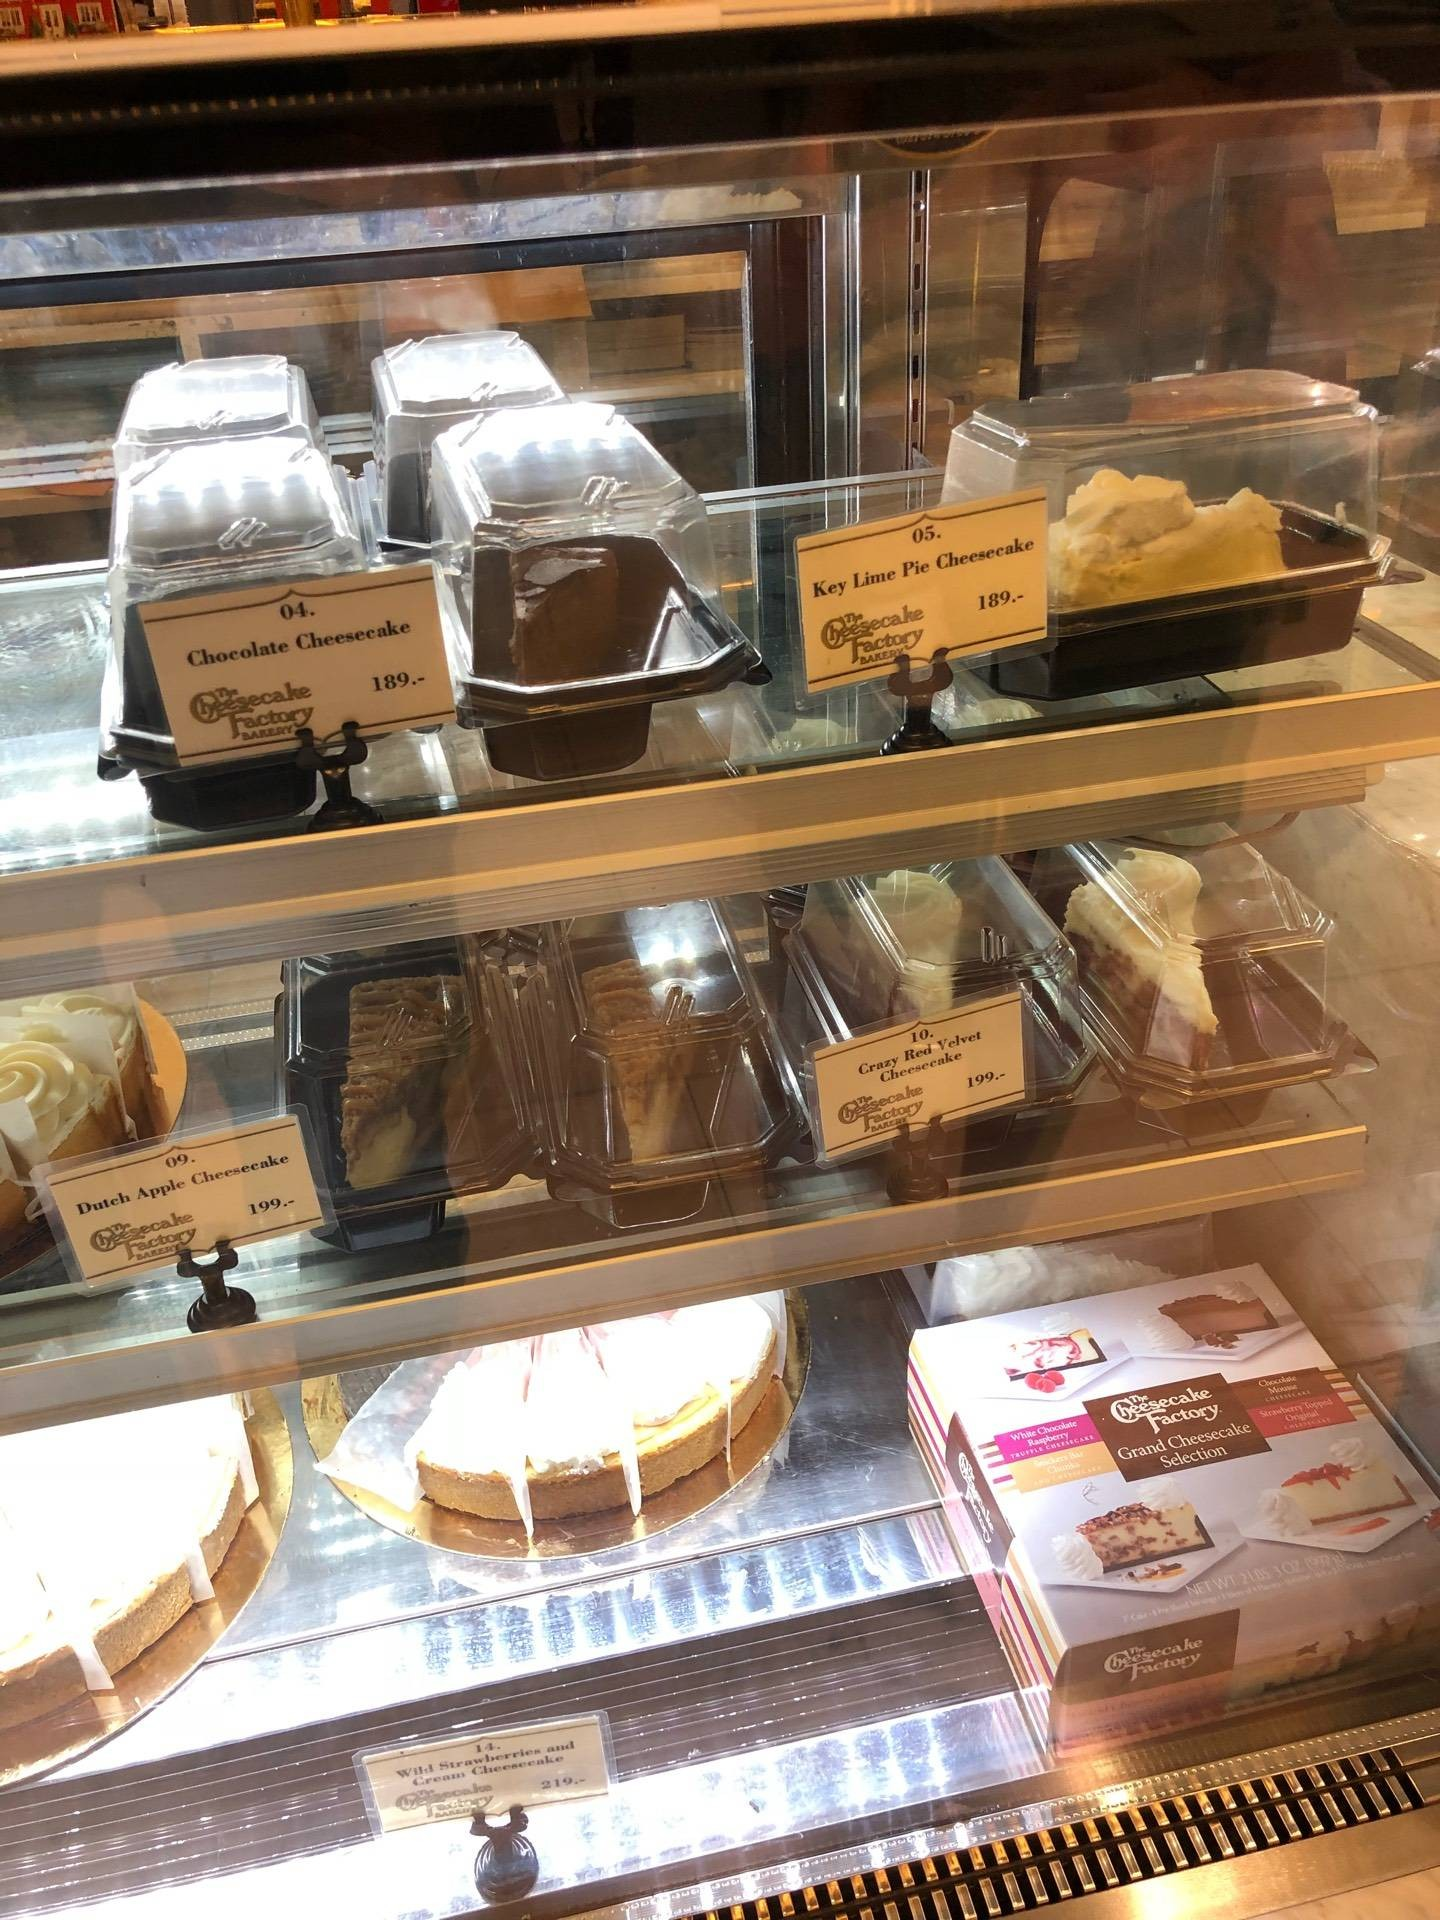 The Cheesecake Factory Bakery สยามพารากอน